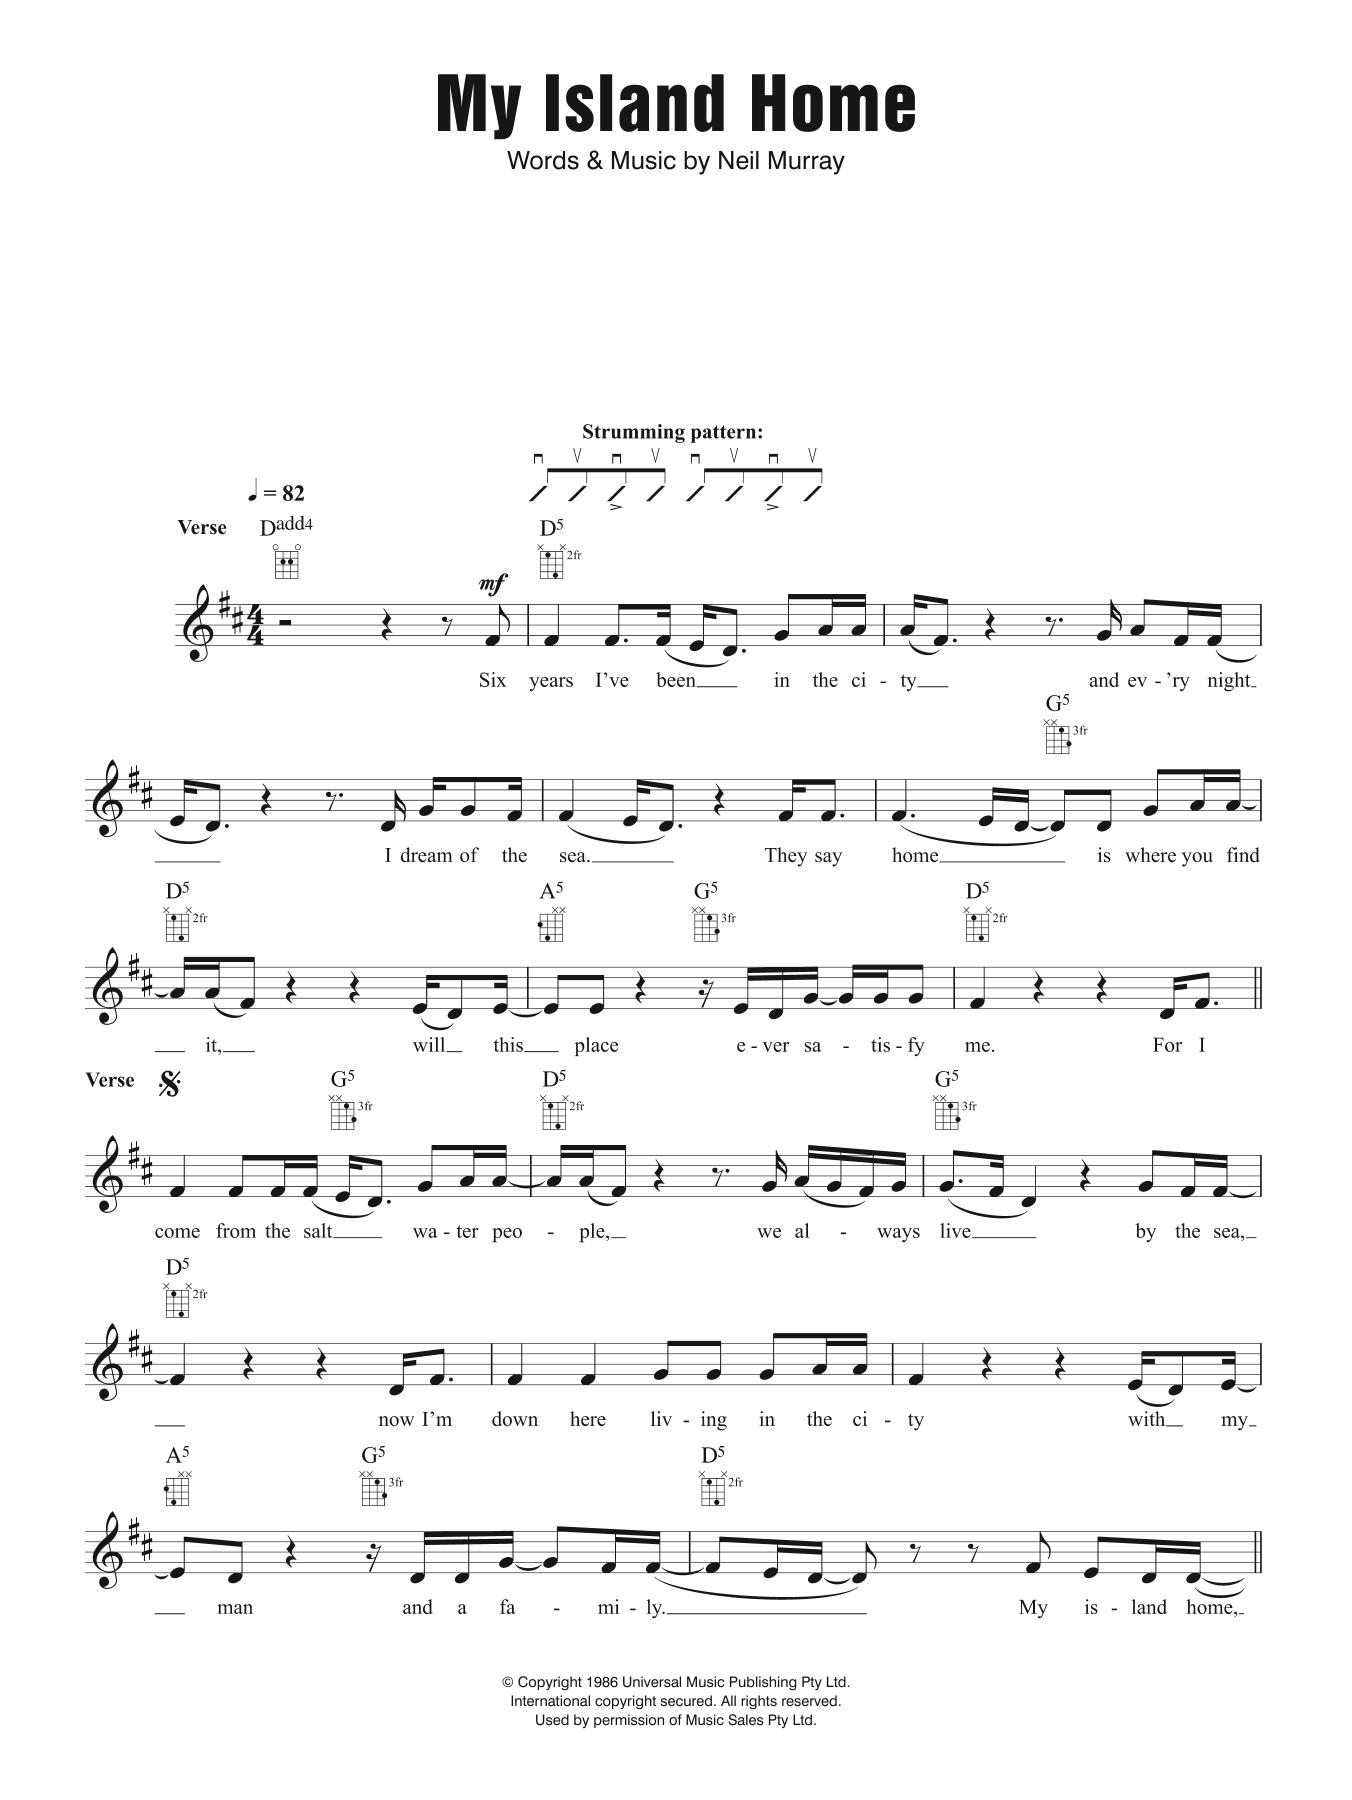 My Island Home Sheet Music